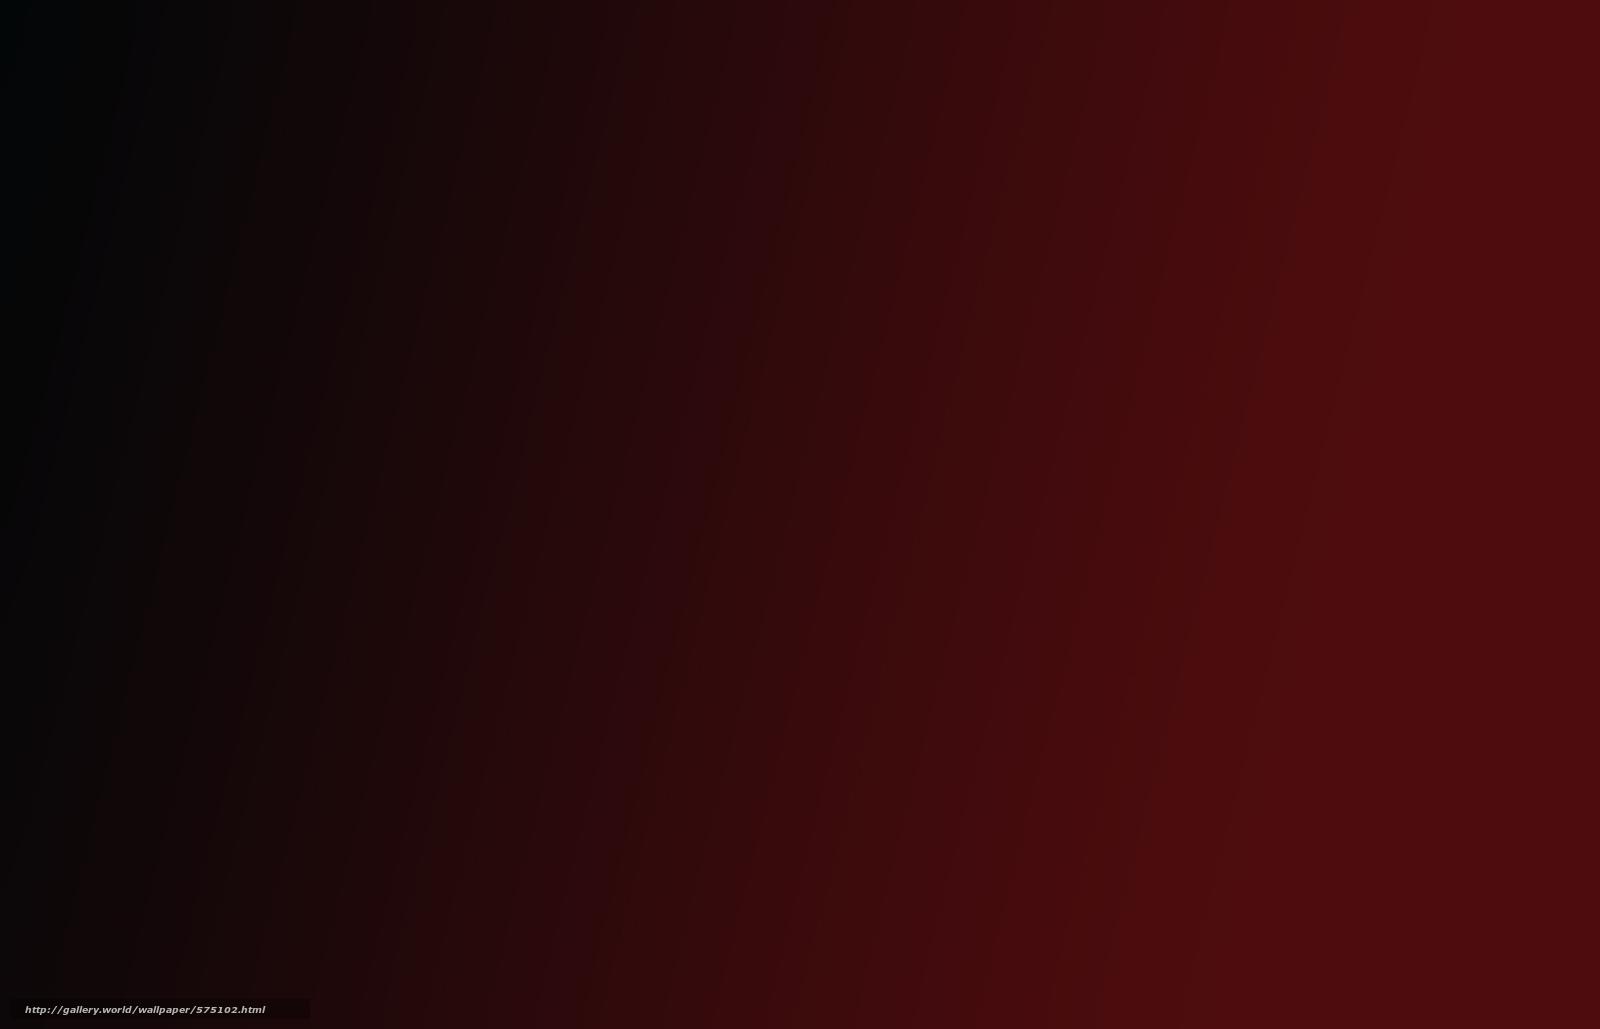 Download wallpaper red, brown, black, burgundy free desktop wallpaper in the resolution 2800x1800 — picture №575102